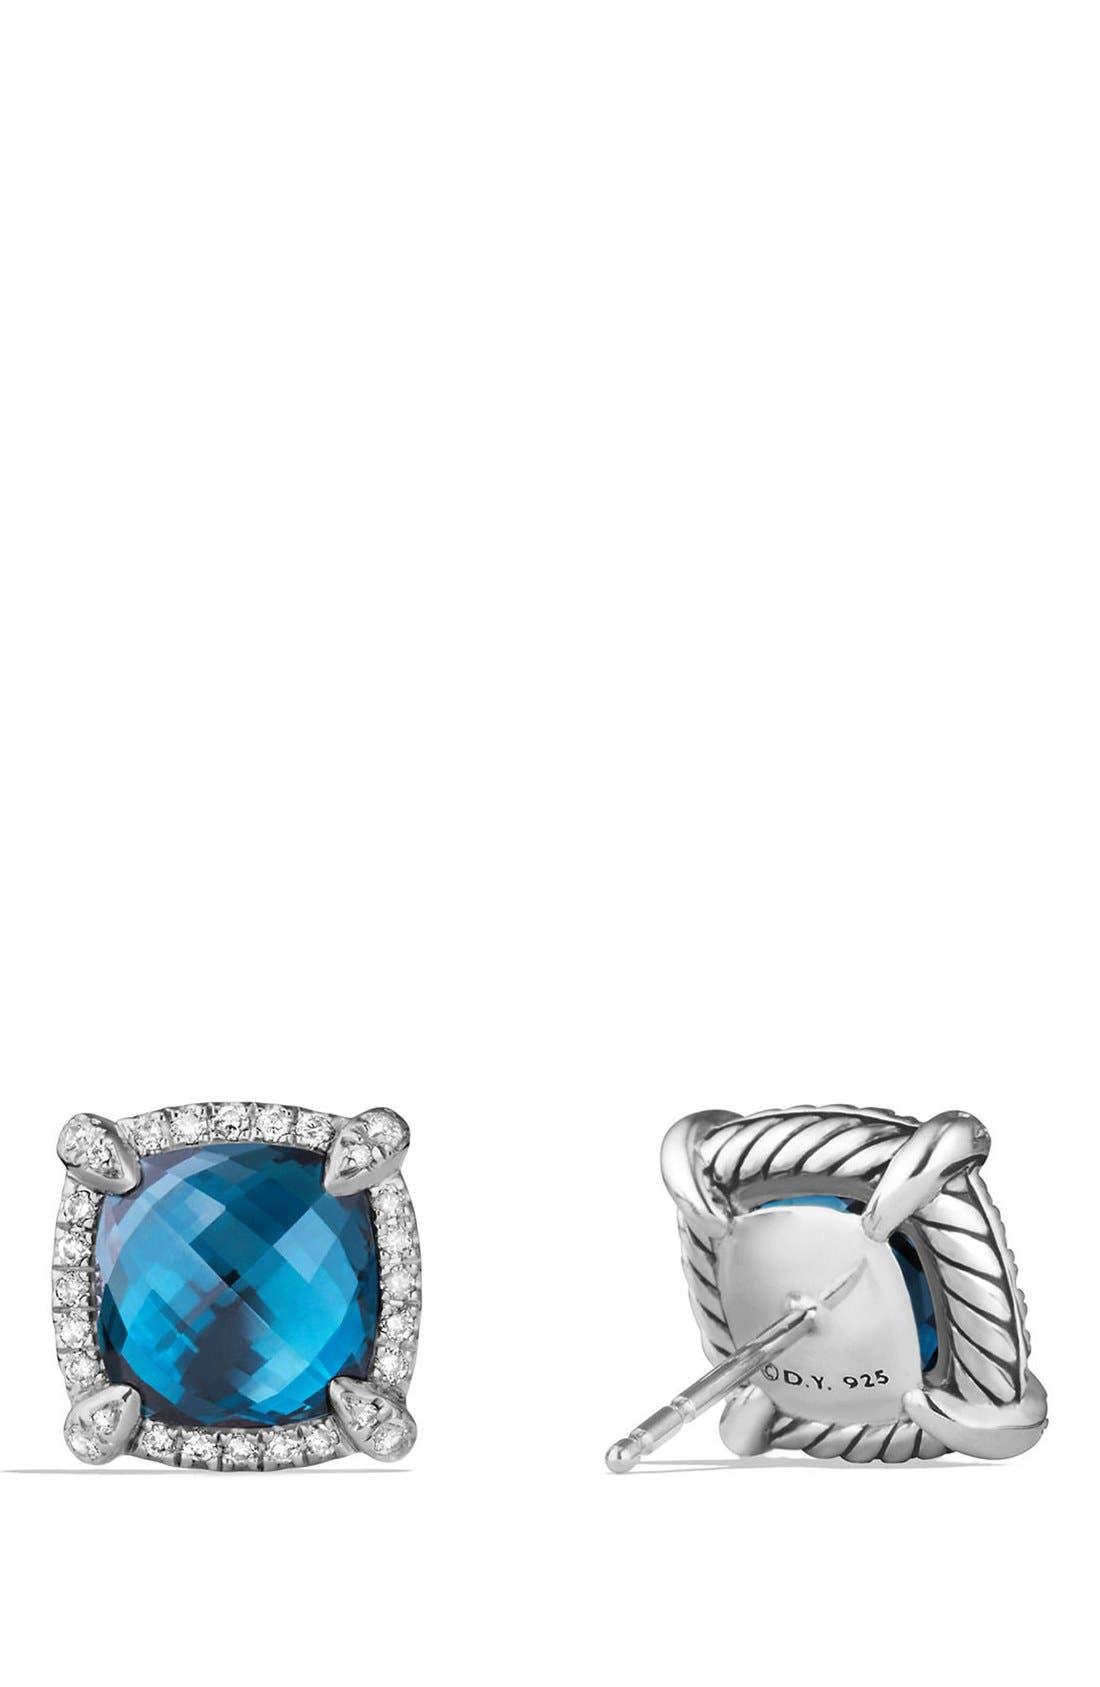 Alternate Image 2  - David Yurman 'Châtelaine' Pavé Bezel Stud Earrings with Diamonds